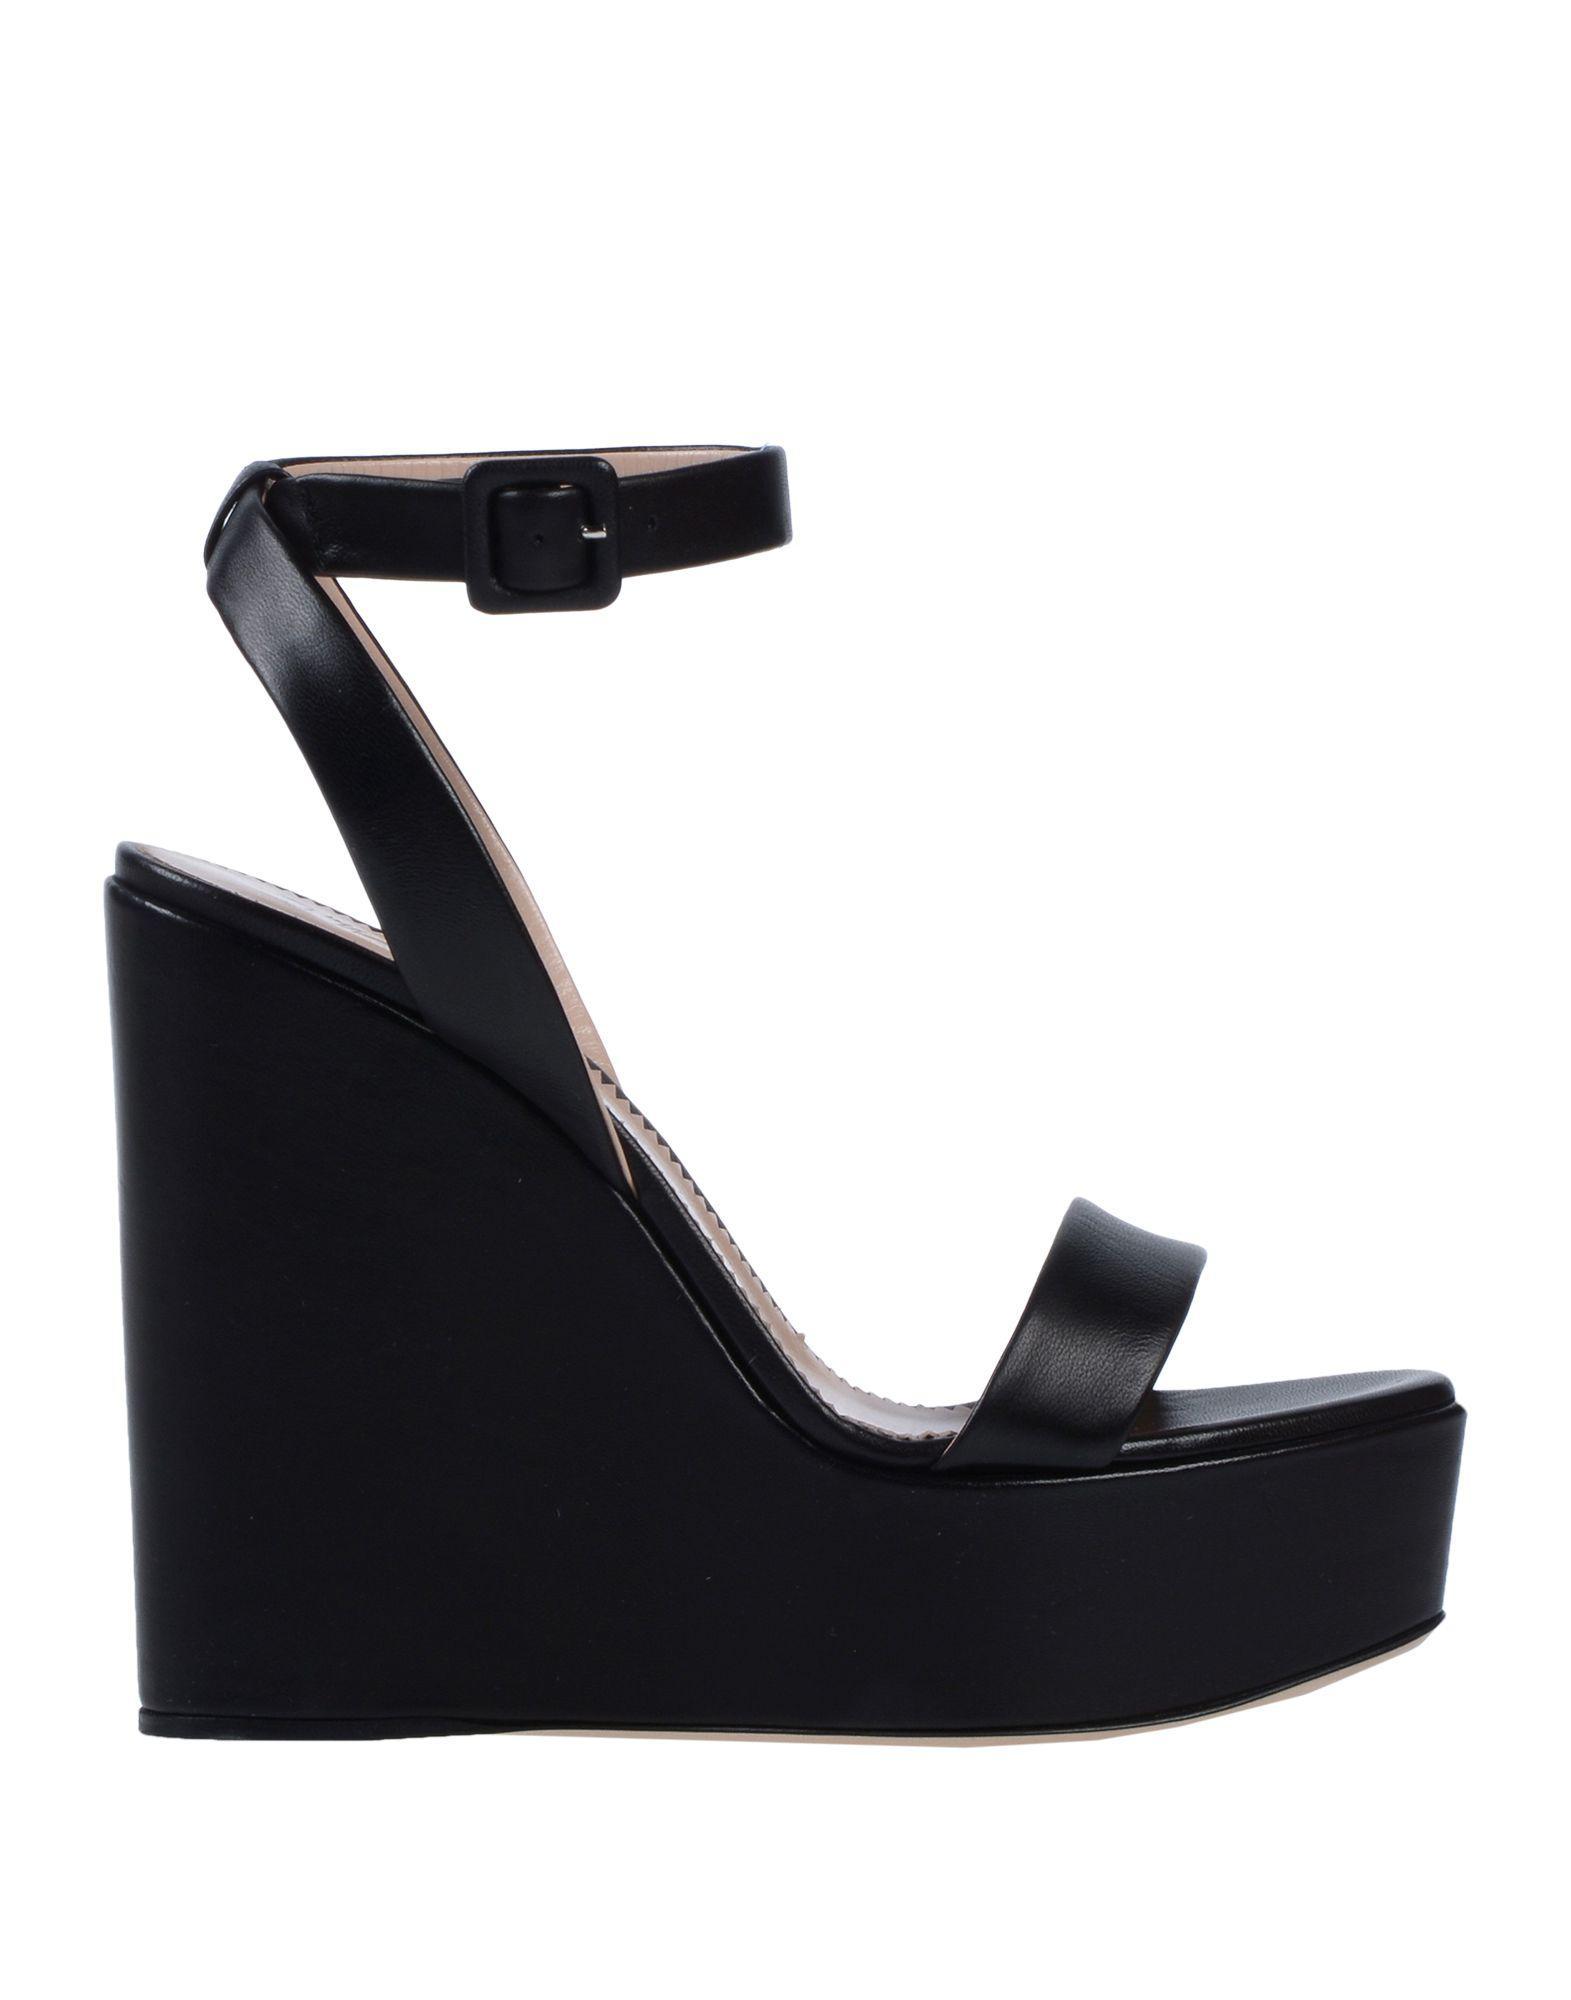 39faf9fbd0f Lyst - Giuseppe Zanotti Sandals in Black